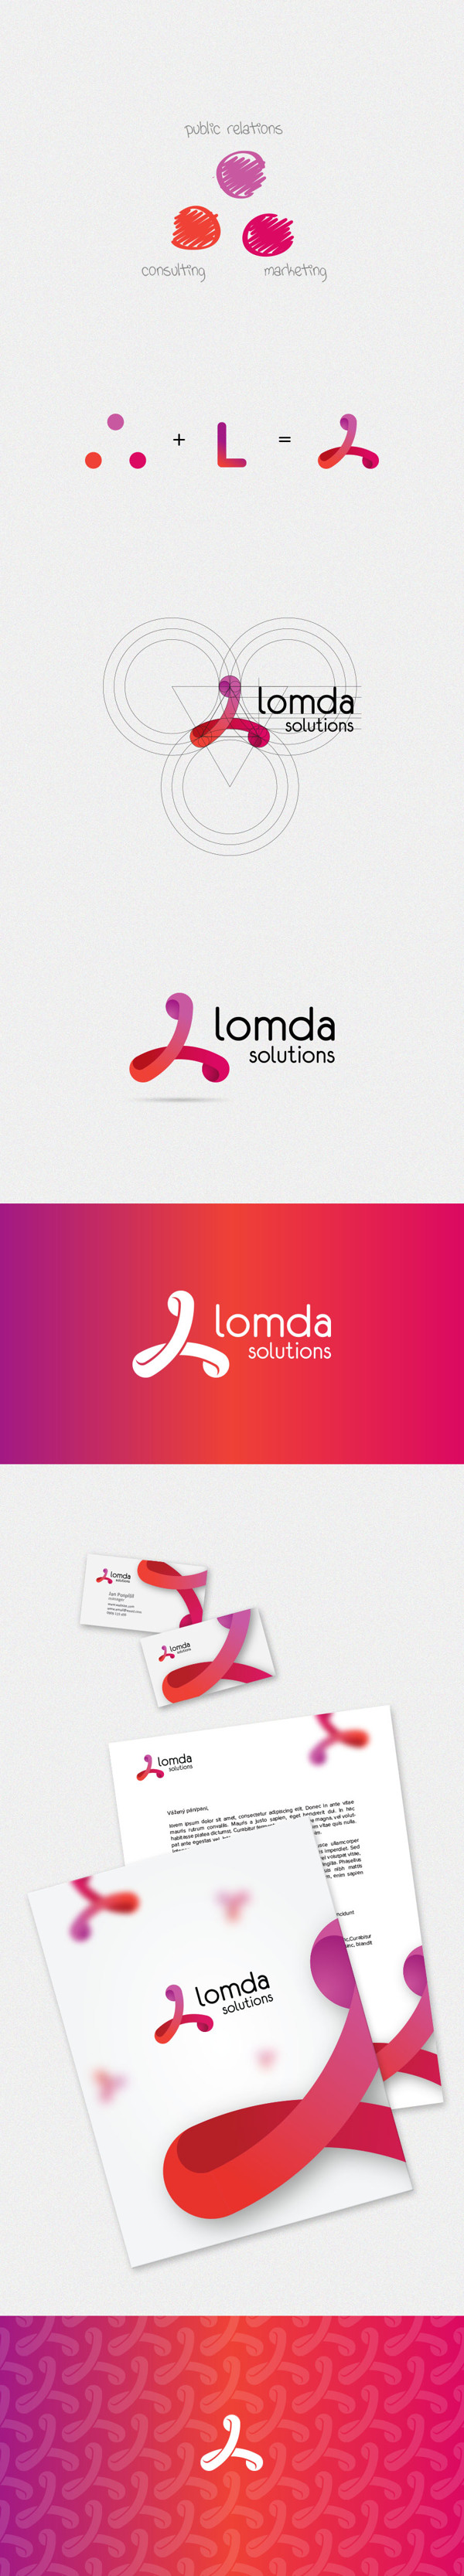 lomda Logo Design